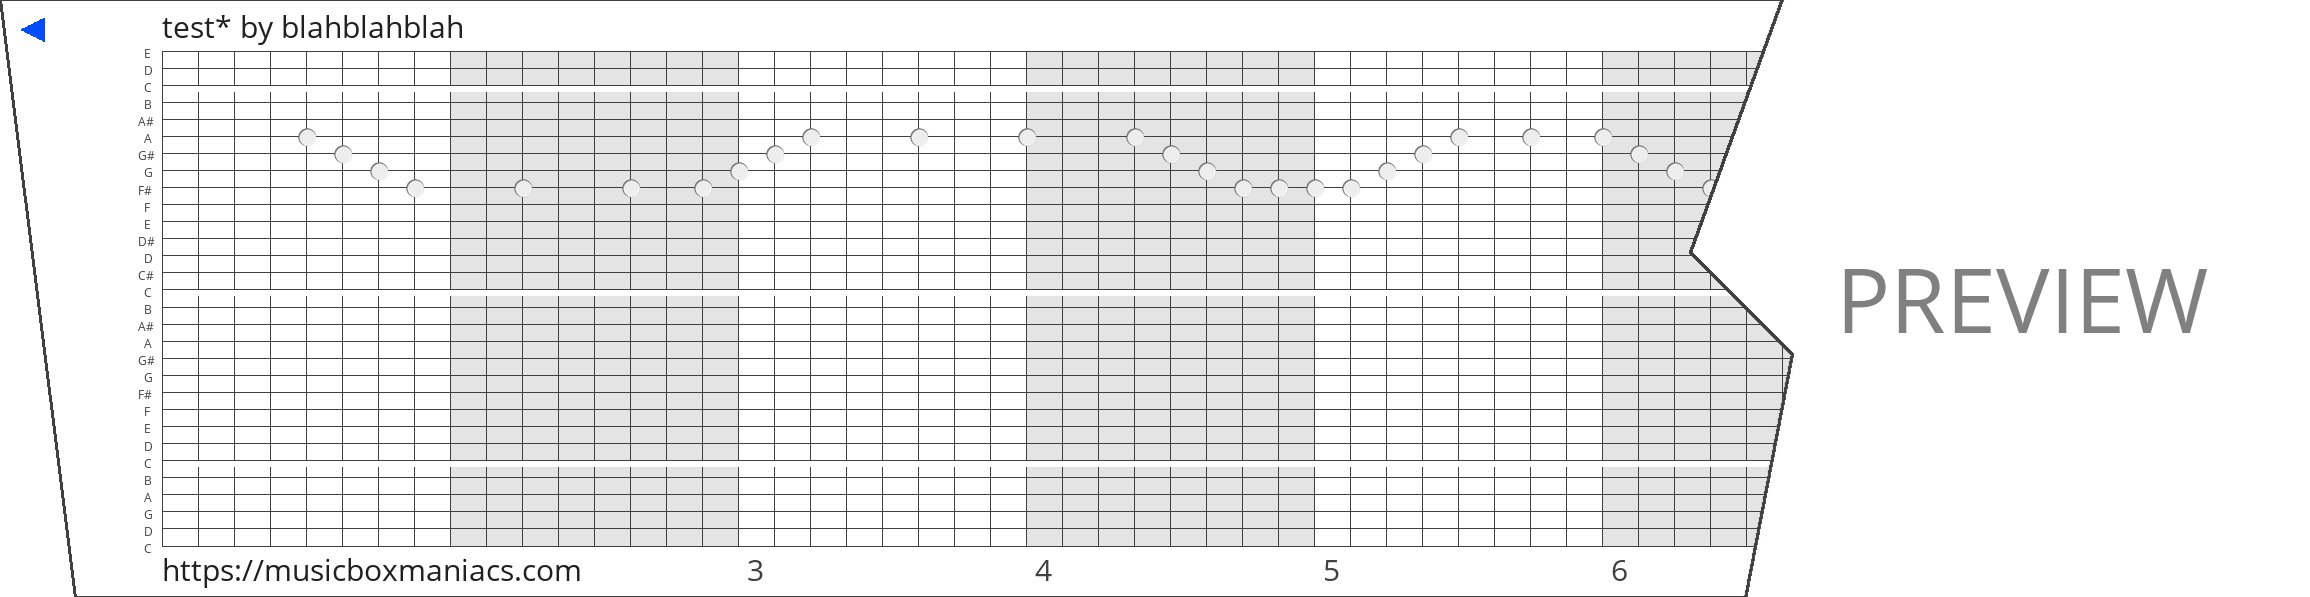 test* 30 note music box paper strip